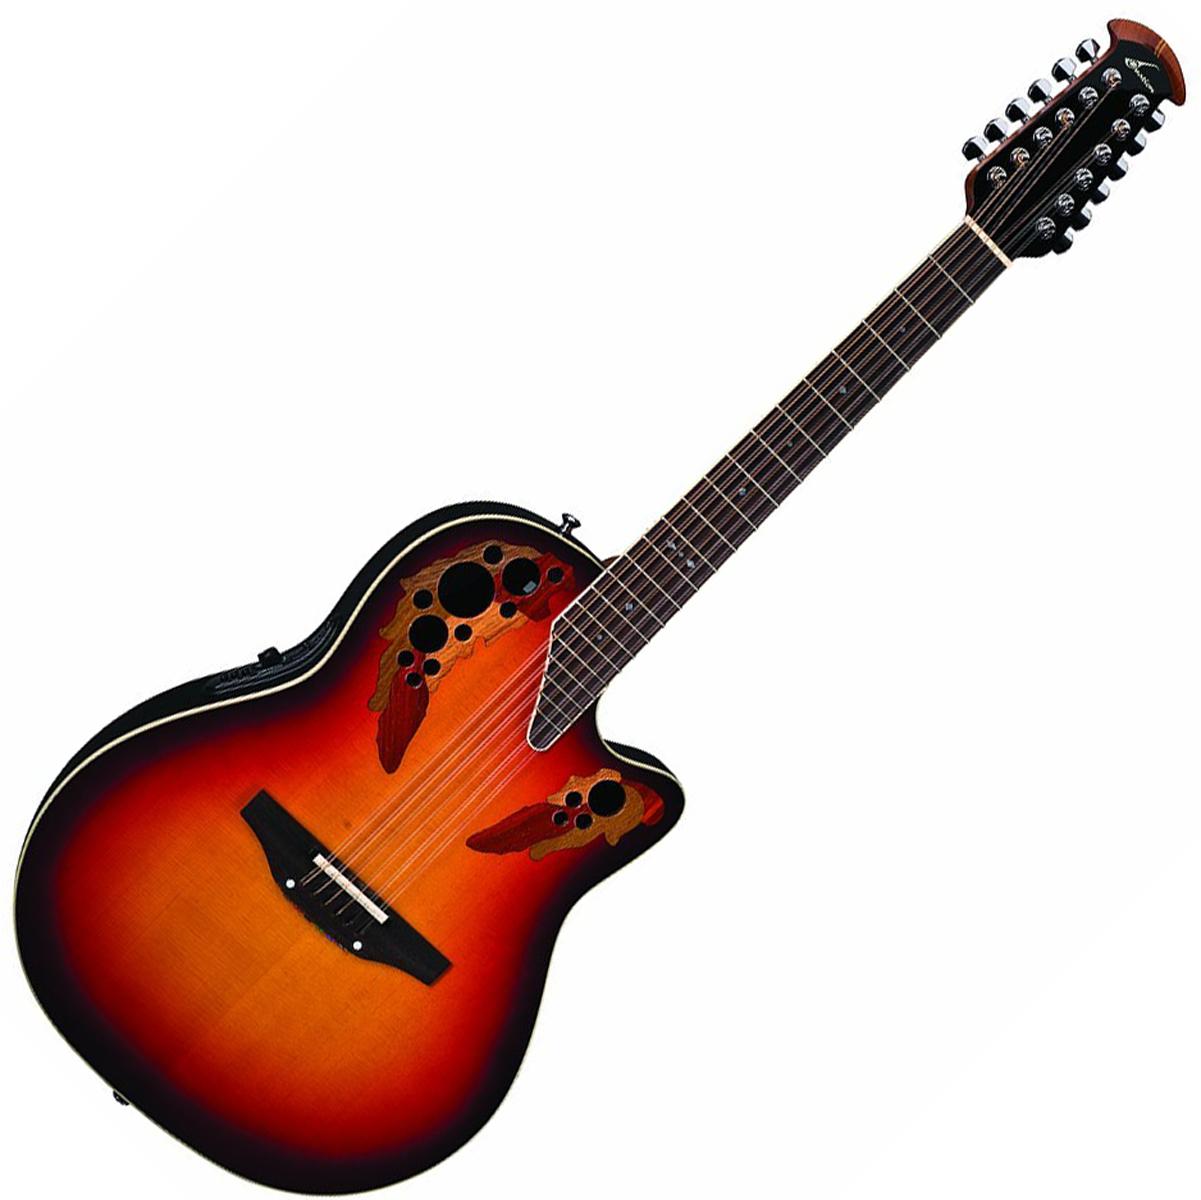 ovation 2758ax neb standard elite 12 string new england burst guitar w case tuner and stand. Black Bedroom Furniture Sets. Home Design Ideas